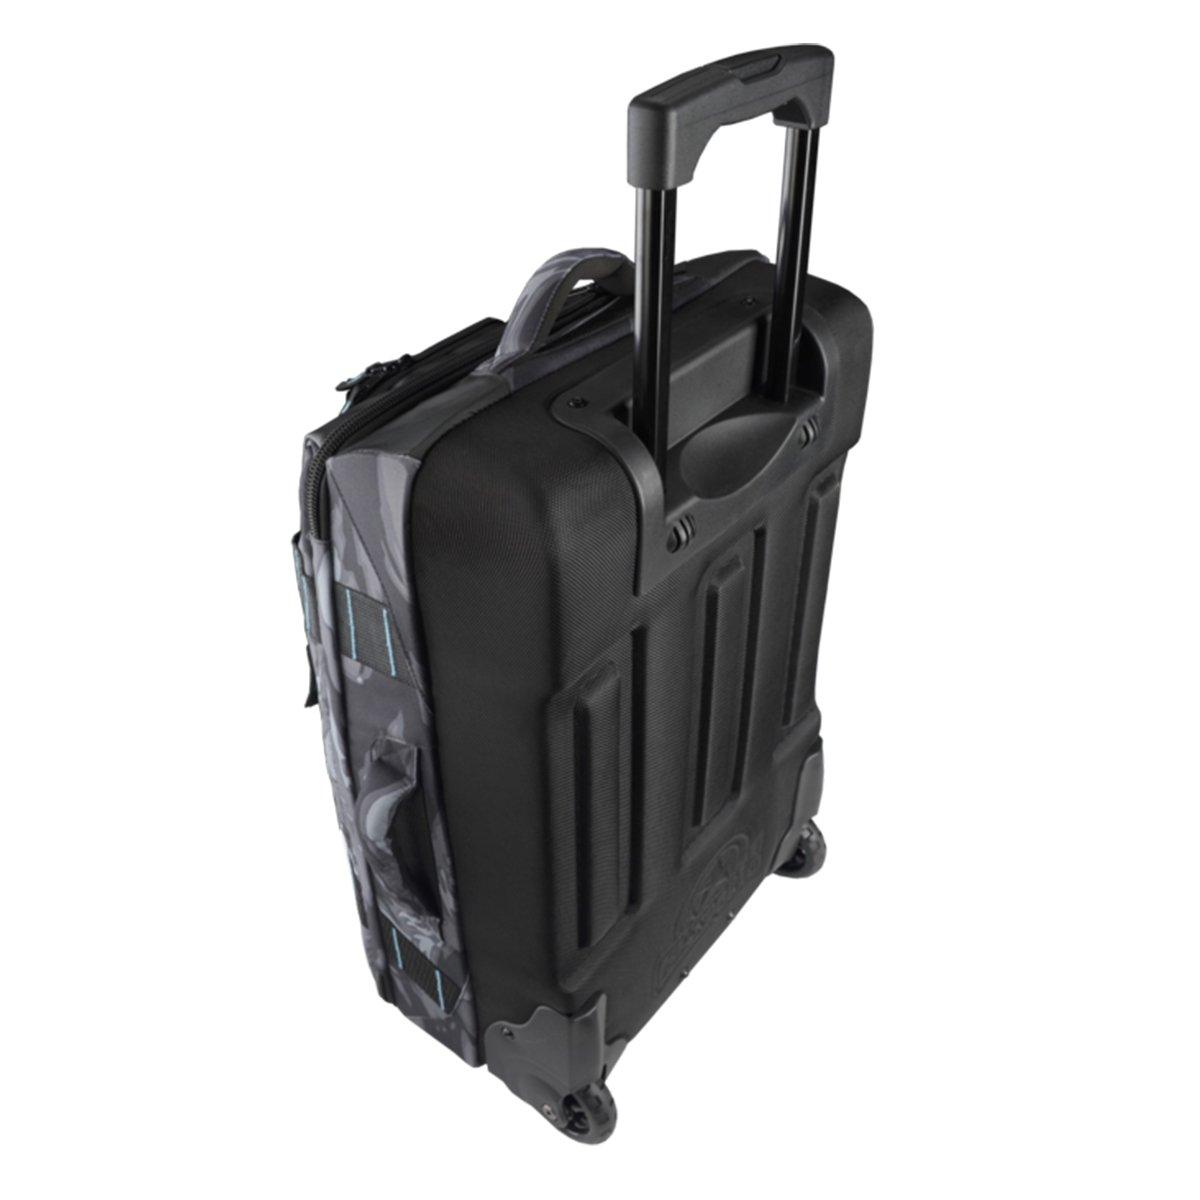 GI Sportz Paintball FLY'R 2.0 Carry On Gear Bag - Tiger Black by GI Sportz (Image #2)